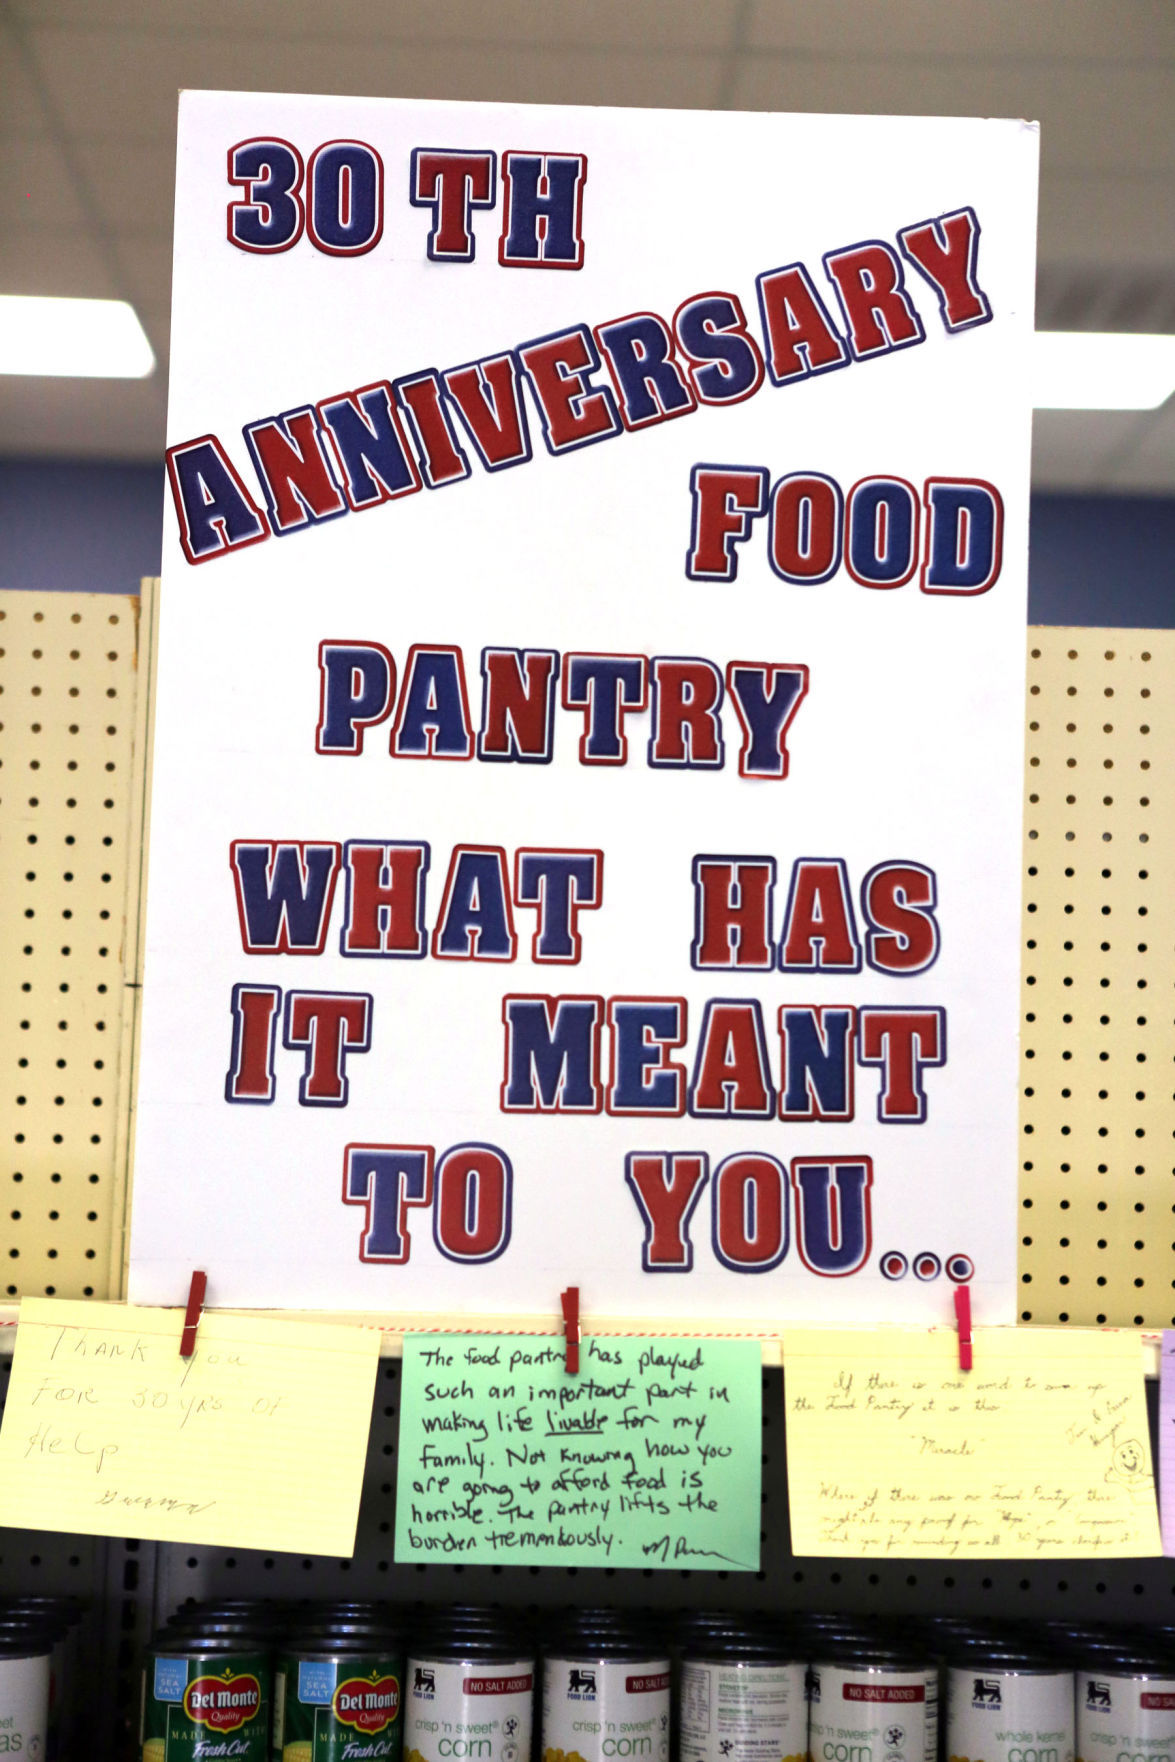 Blacksburg interfaith food pantry celebrates 30 years for Interfaith food pantry blacksburg